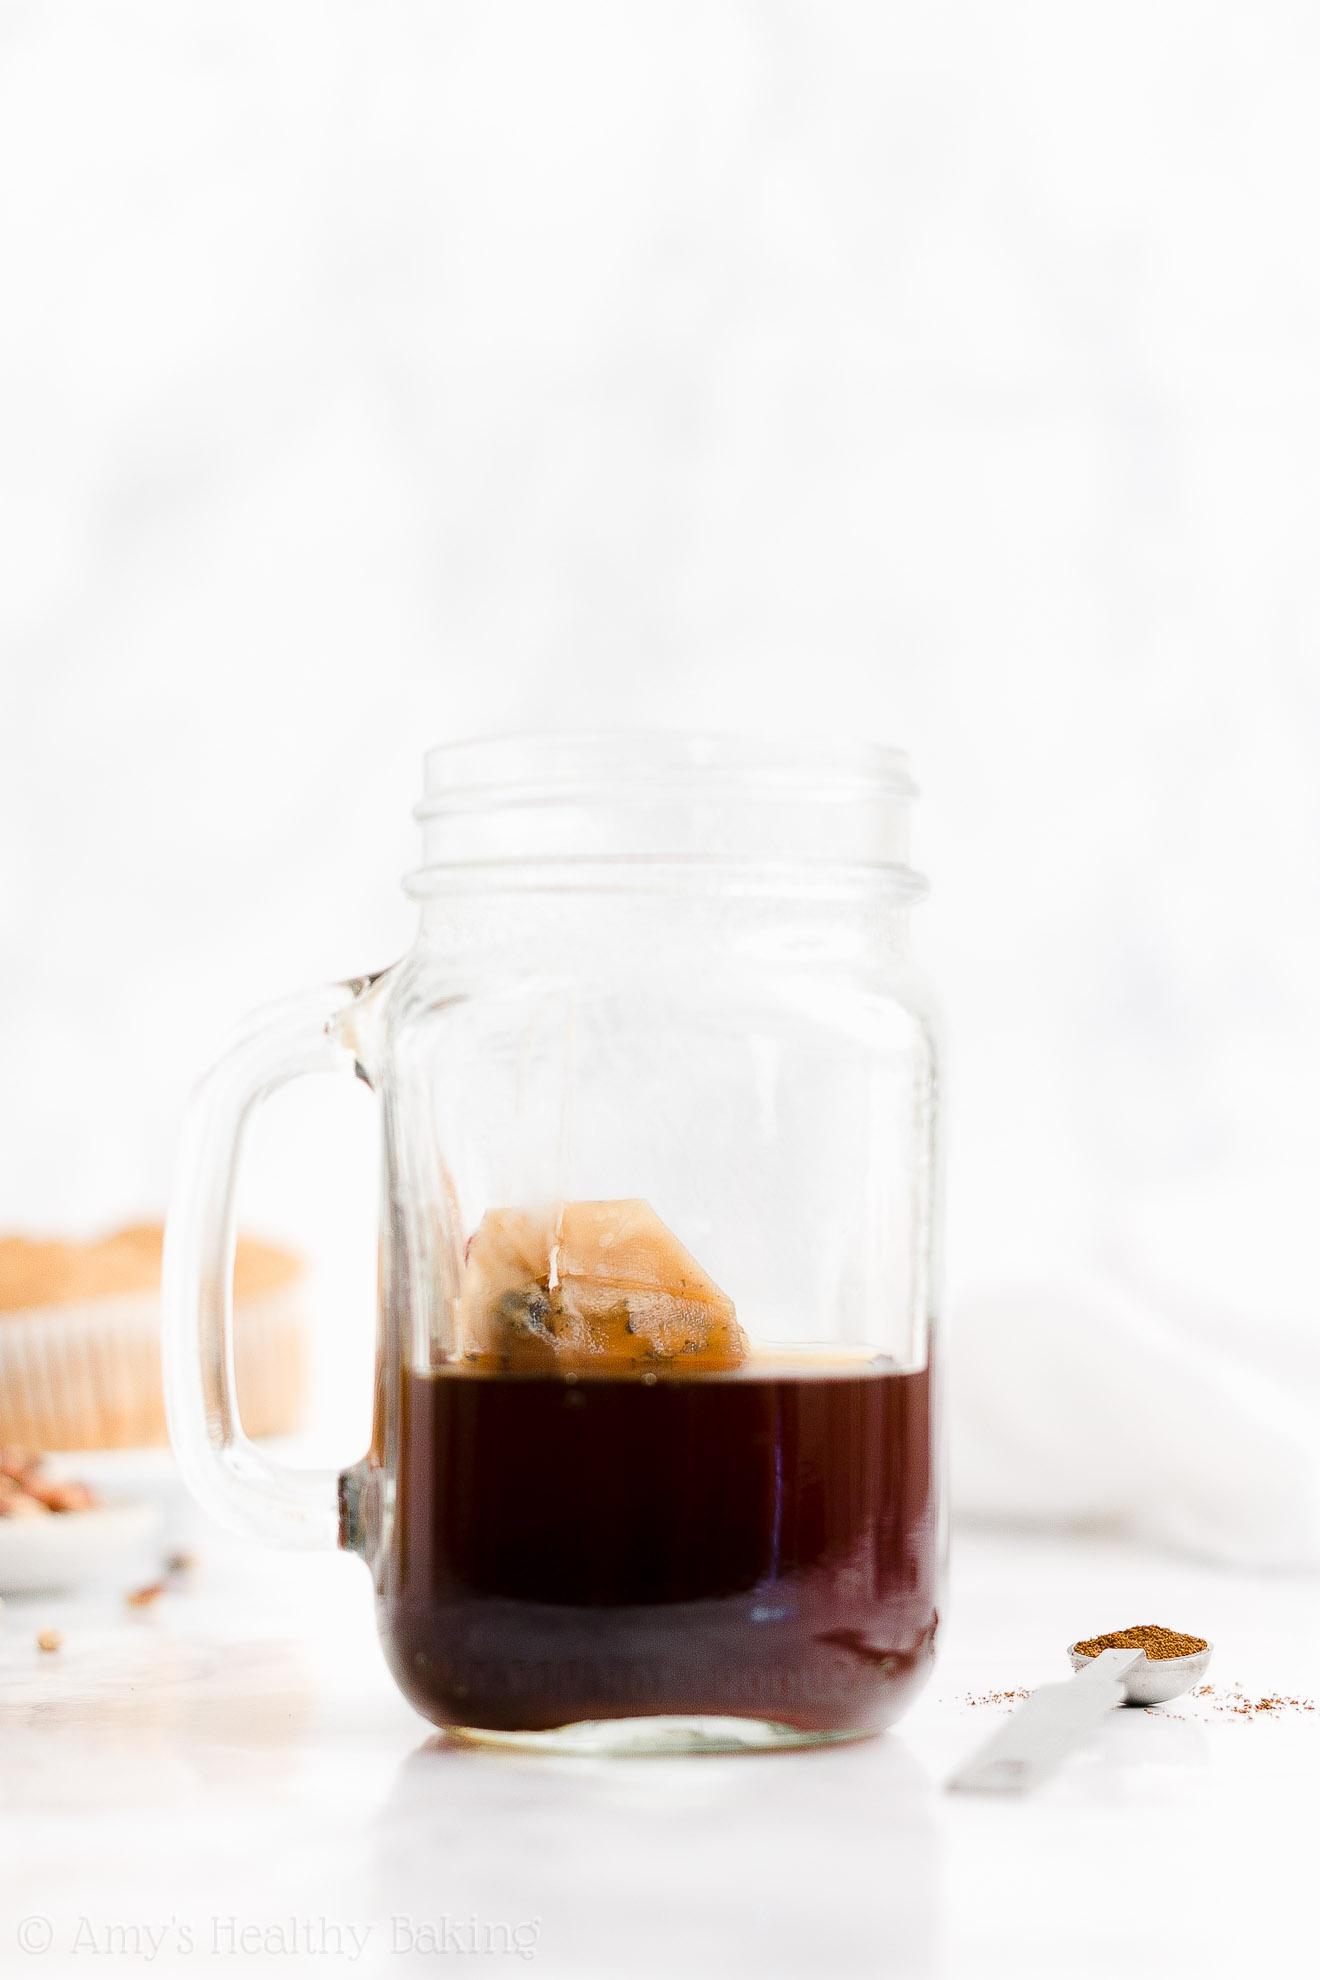 BEST EVER Easy Healthy Homemade Vegan Almond Milk Eggnog Chai Latte